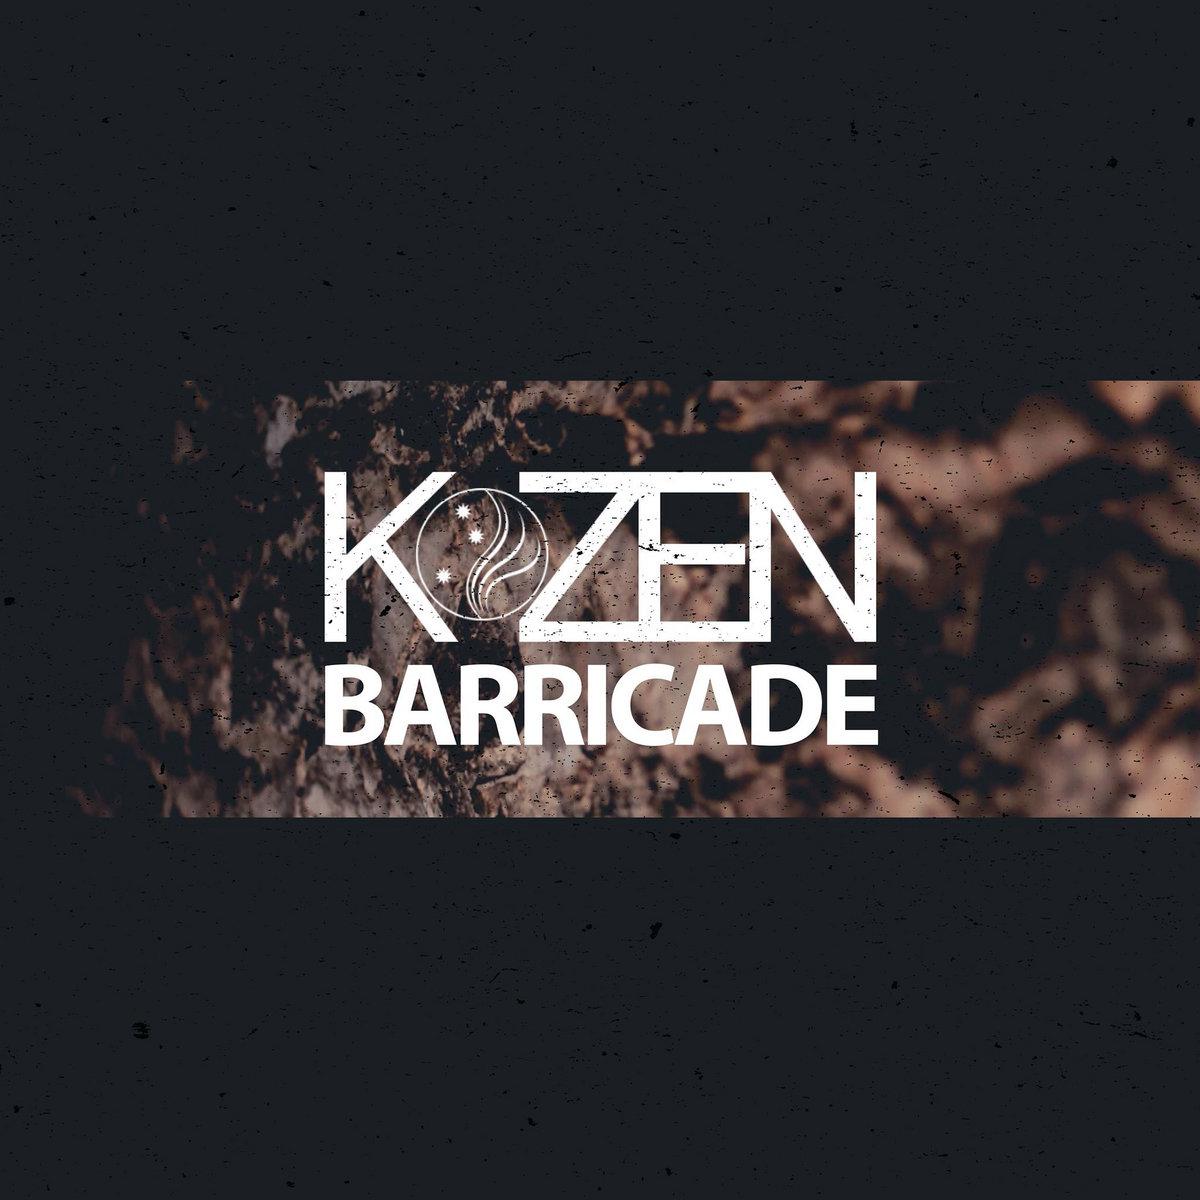 Barricade by KOZEN